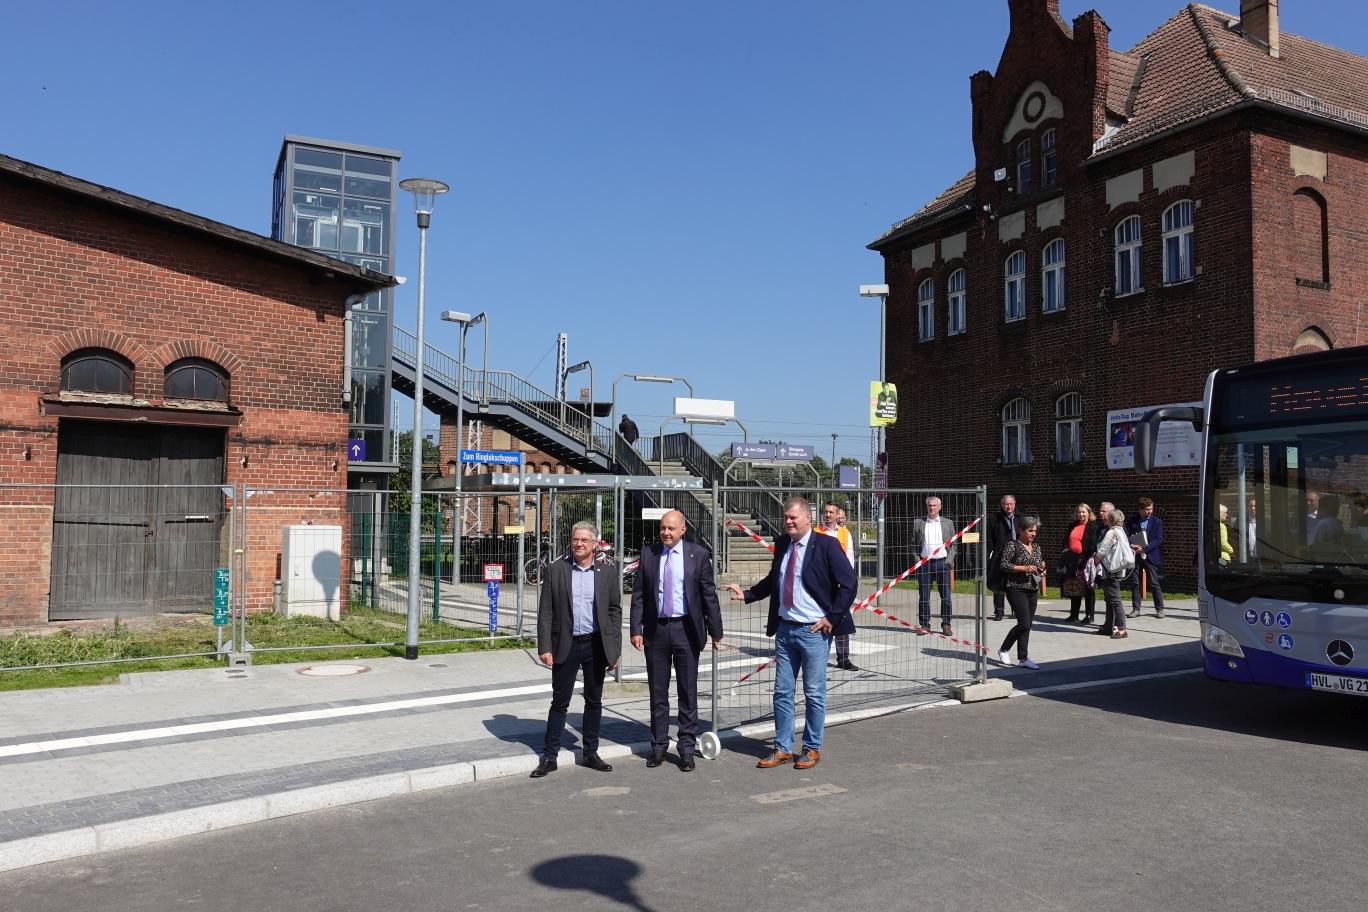 vl. Andreas Guttschau, Roger Lewandowski, Holger Schreiber